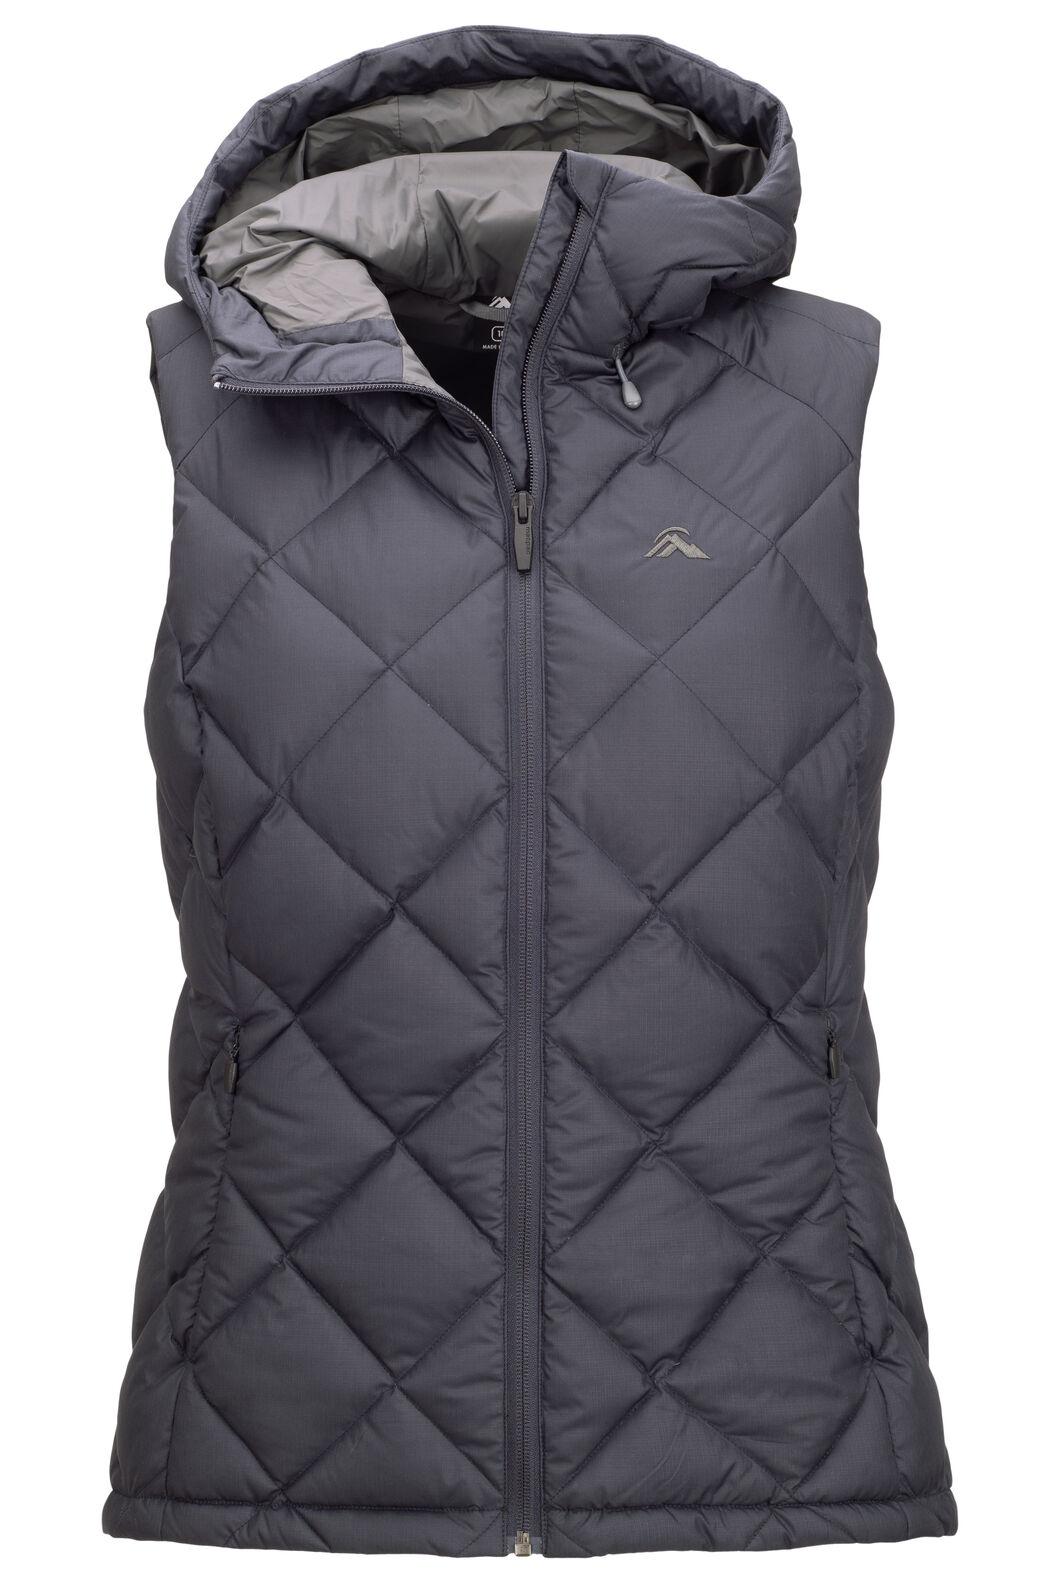 Macpac Zenith Hooded Down Vest — Women's, Carbon, hi-res